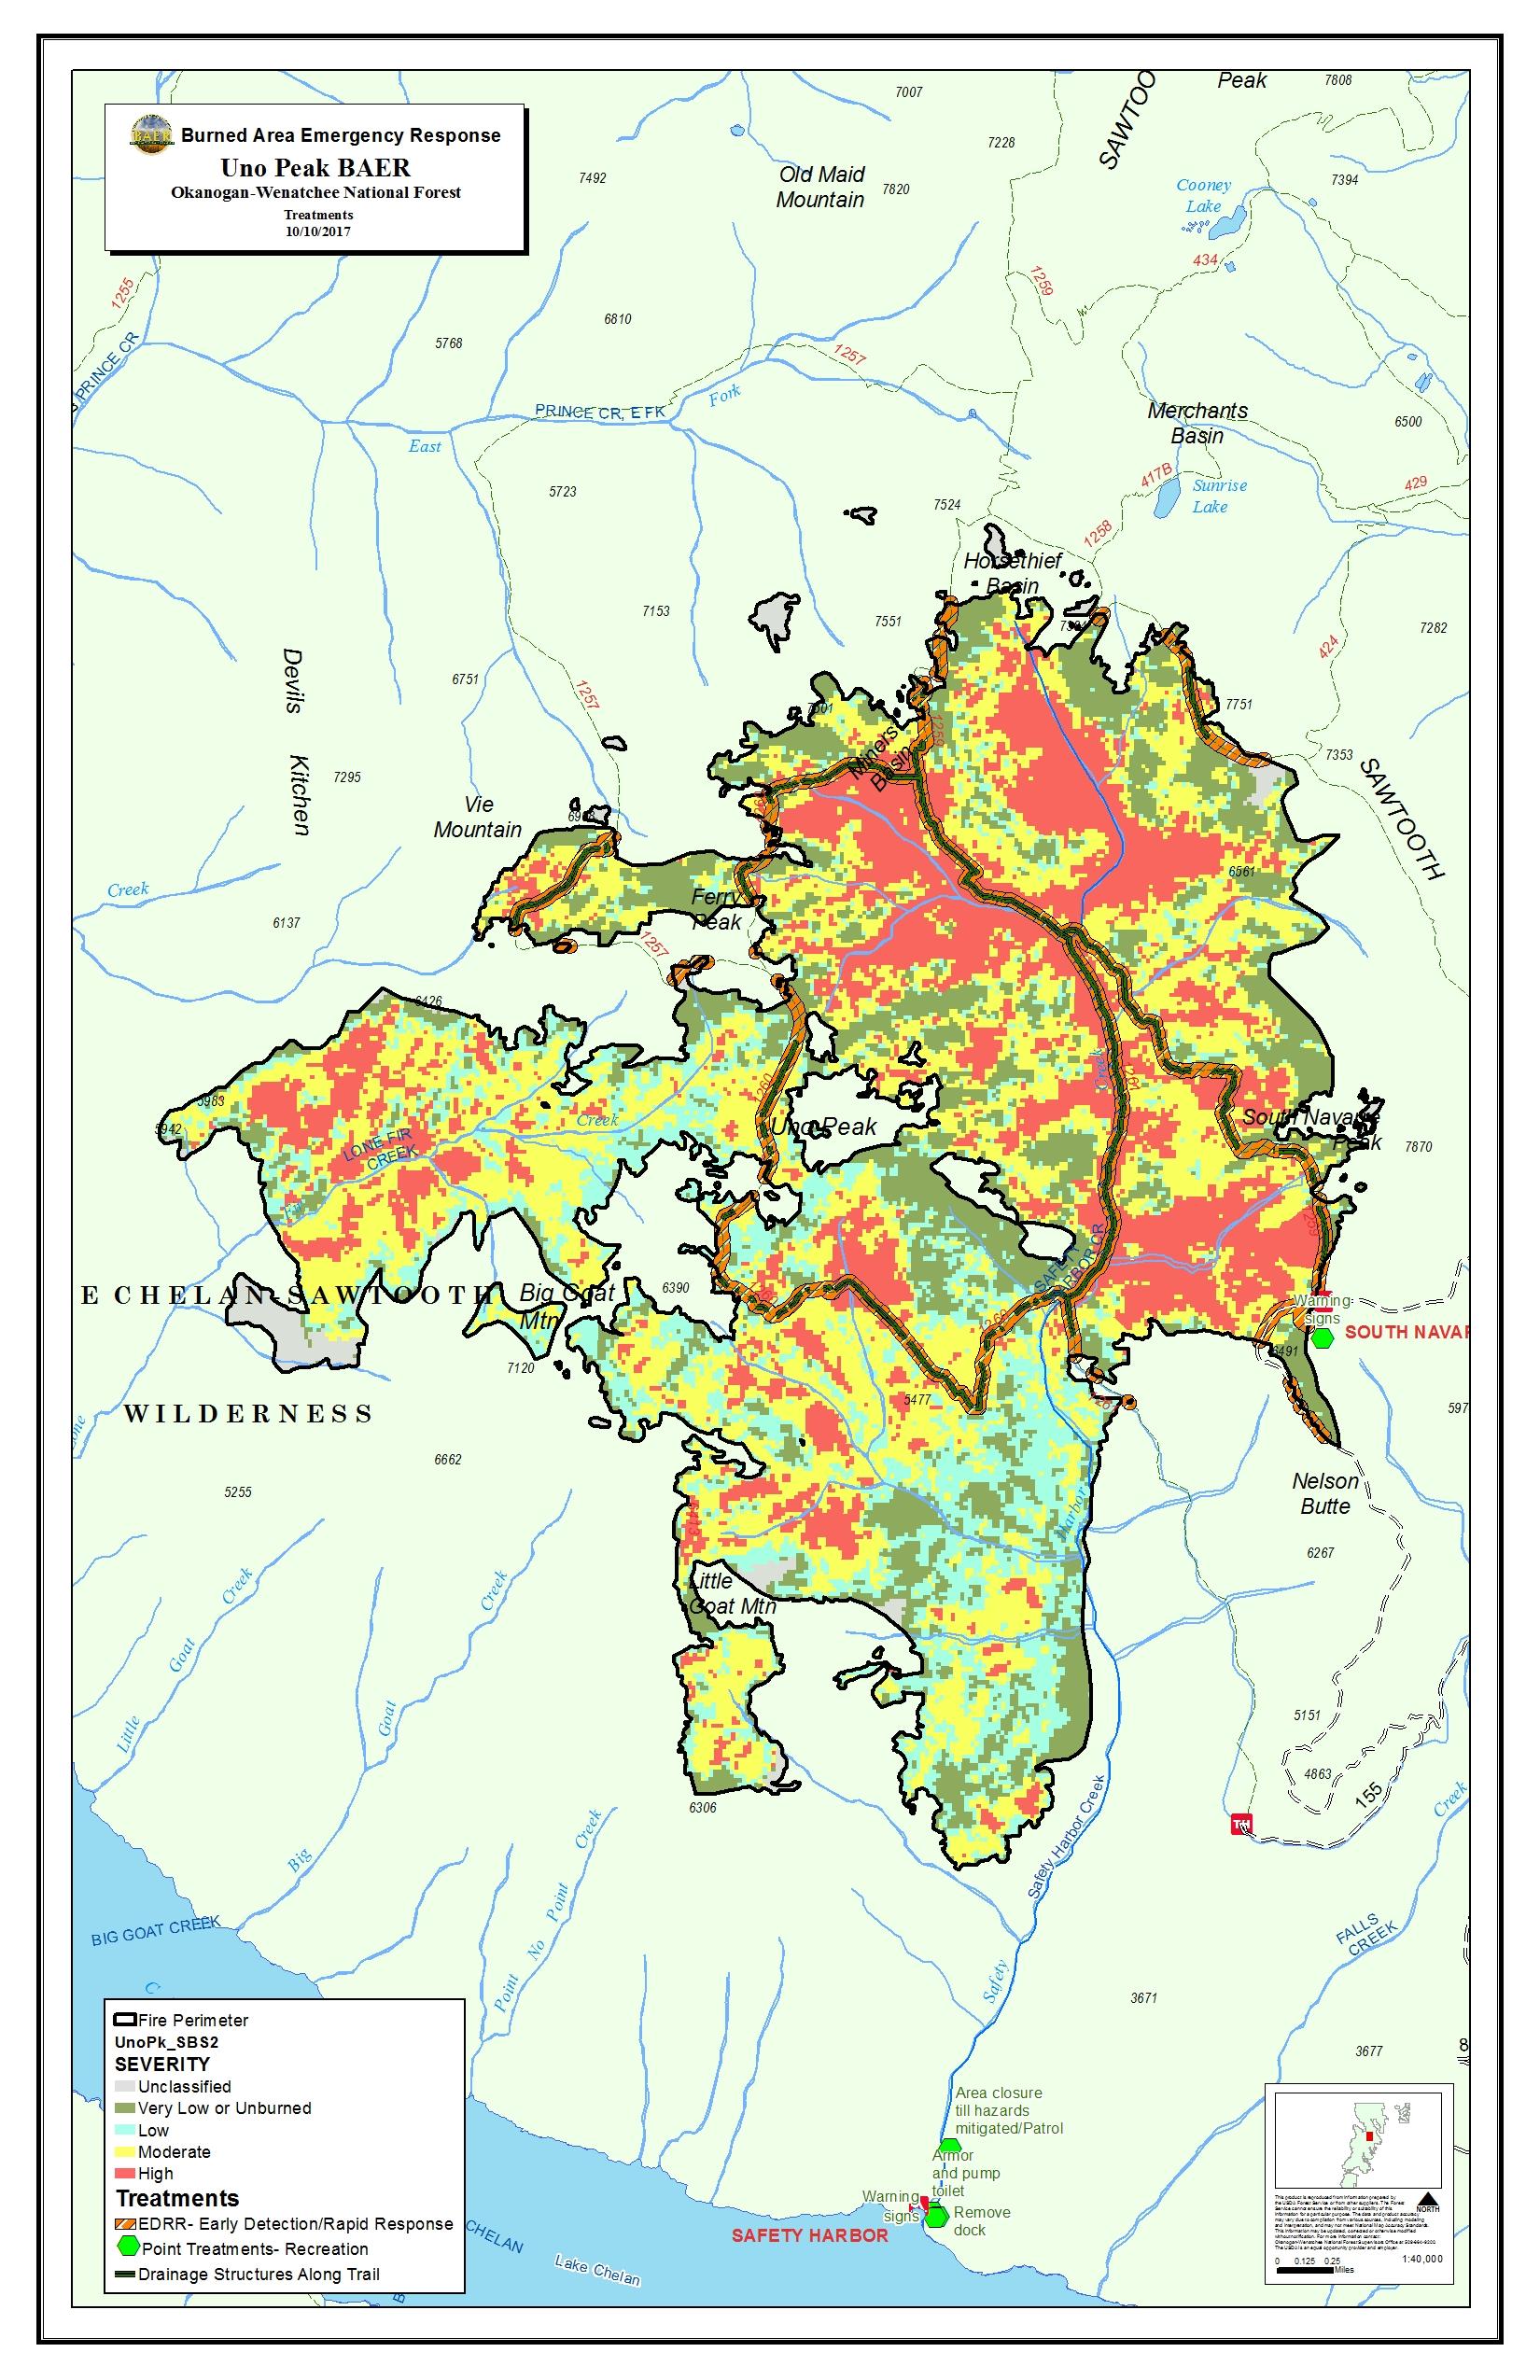 Peak Fire Map.Uno Peak Fire Central Washington Fire Recovery 2017